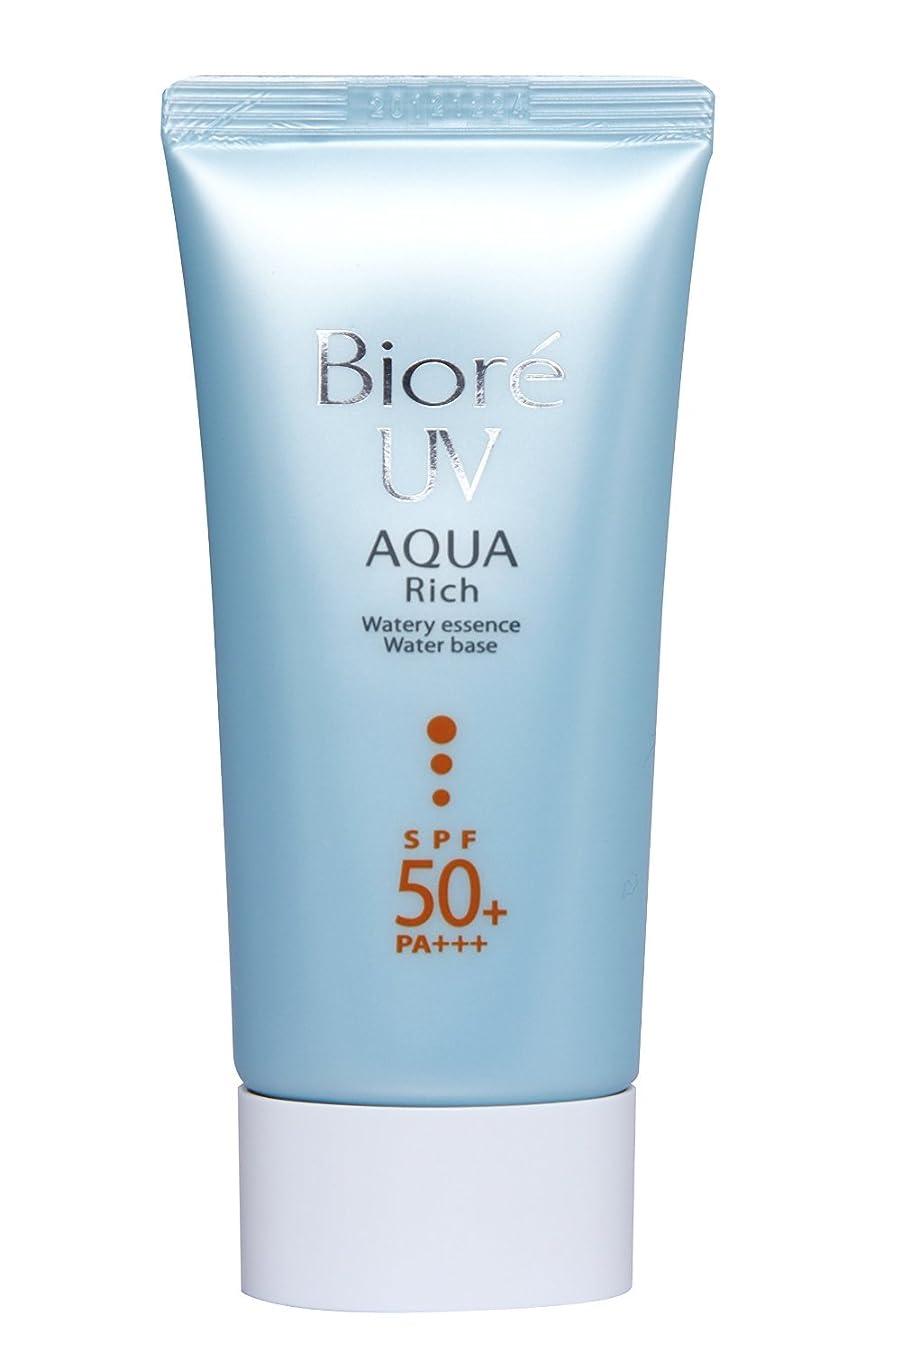 最適ソフィー批判Biore Uv Aqua Rich Watery Essence spf50?+ / PA + + + 50?ml